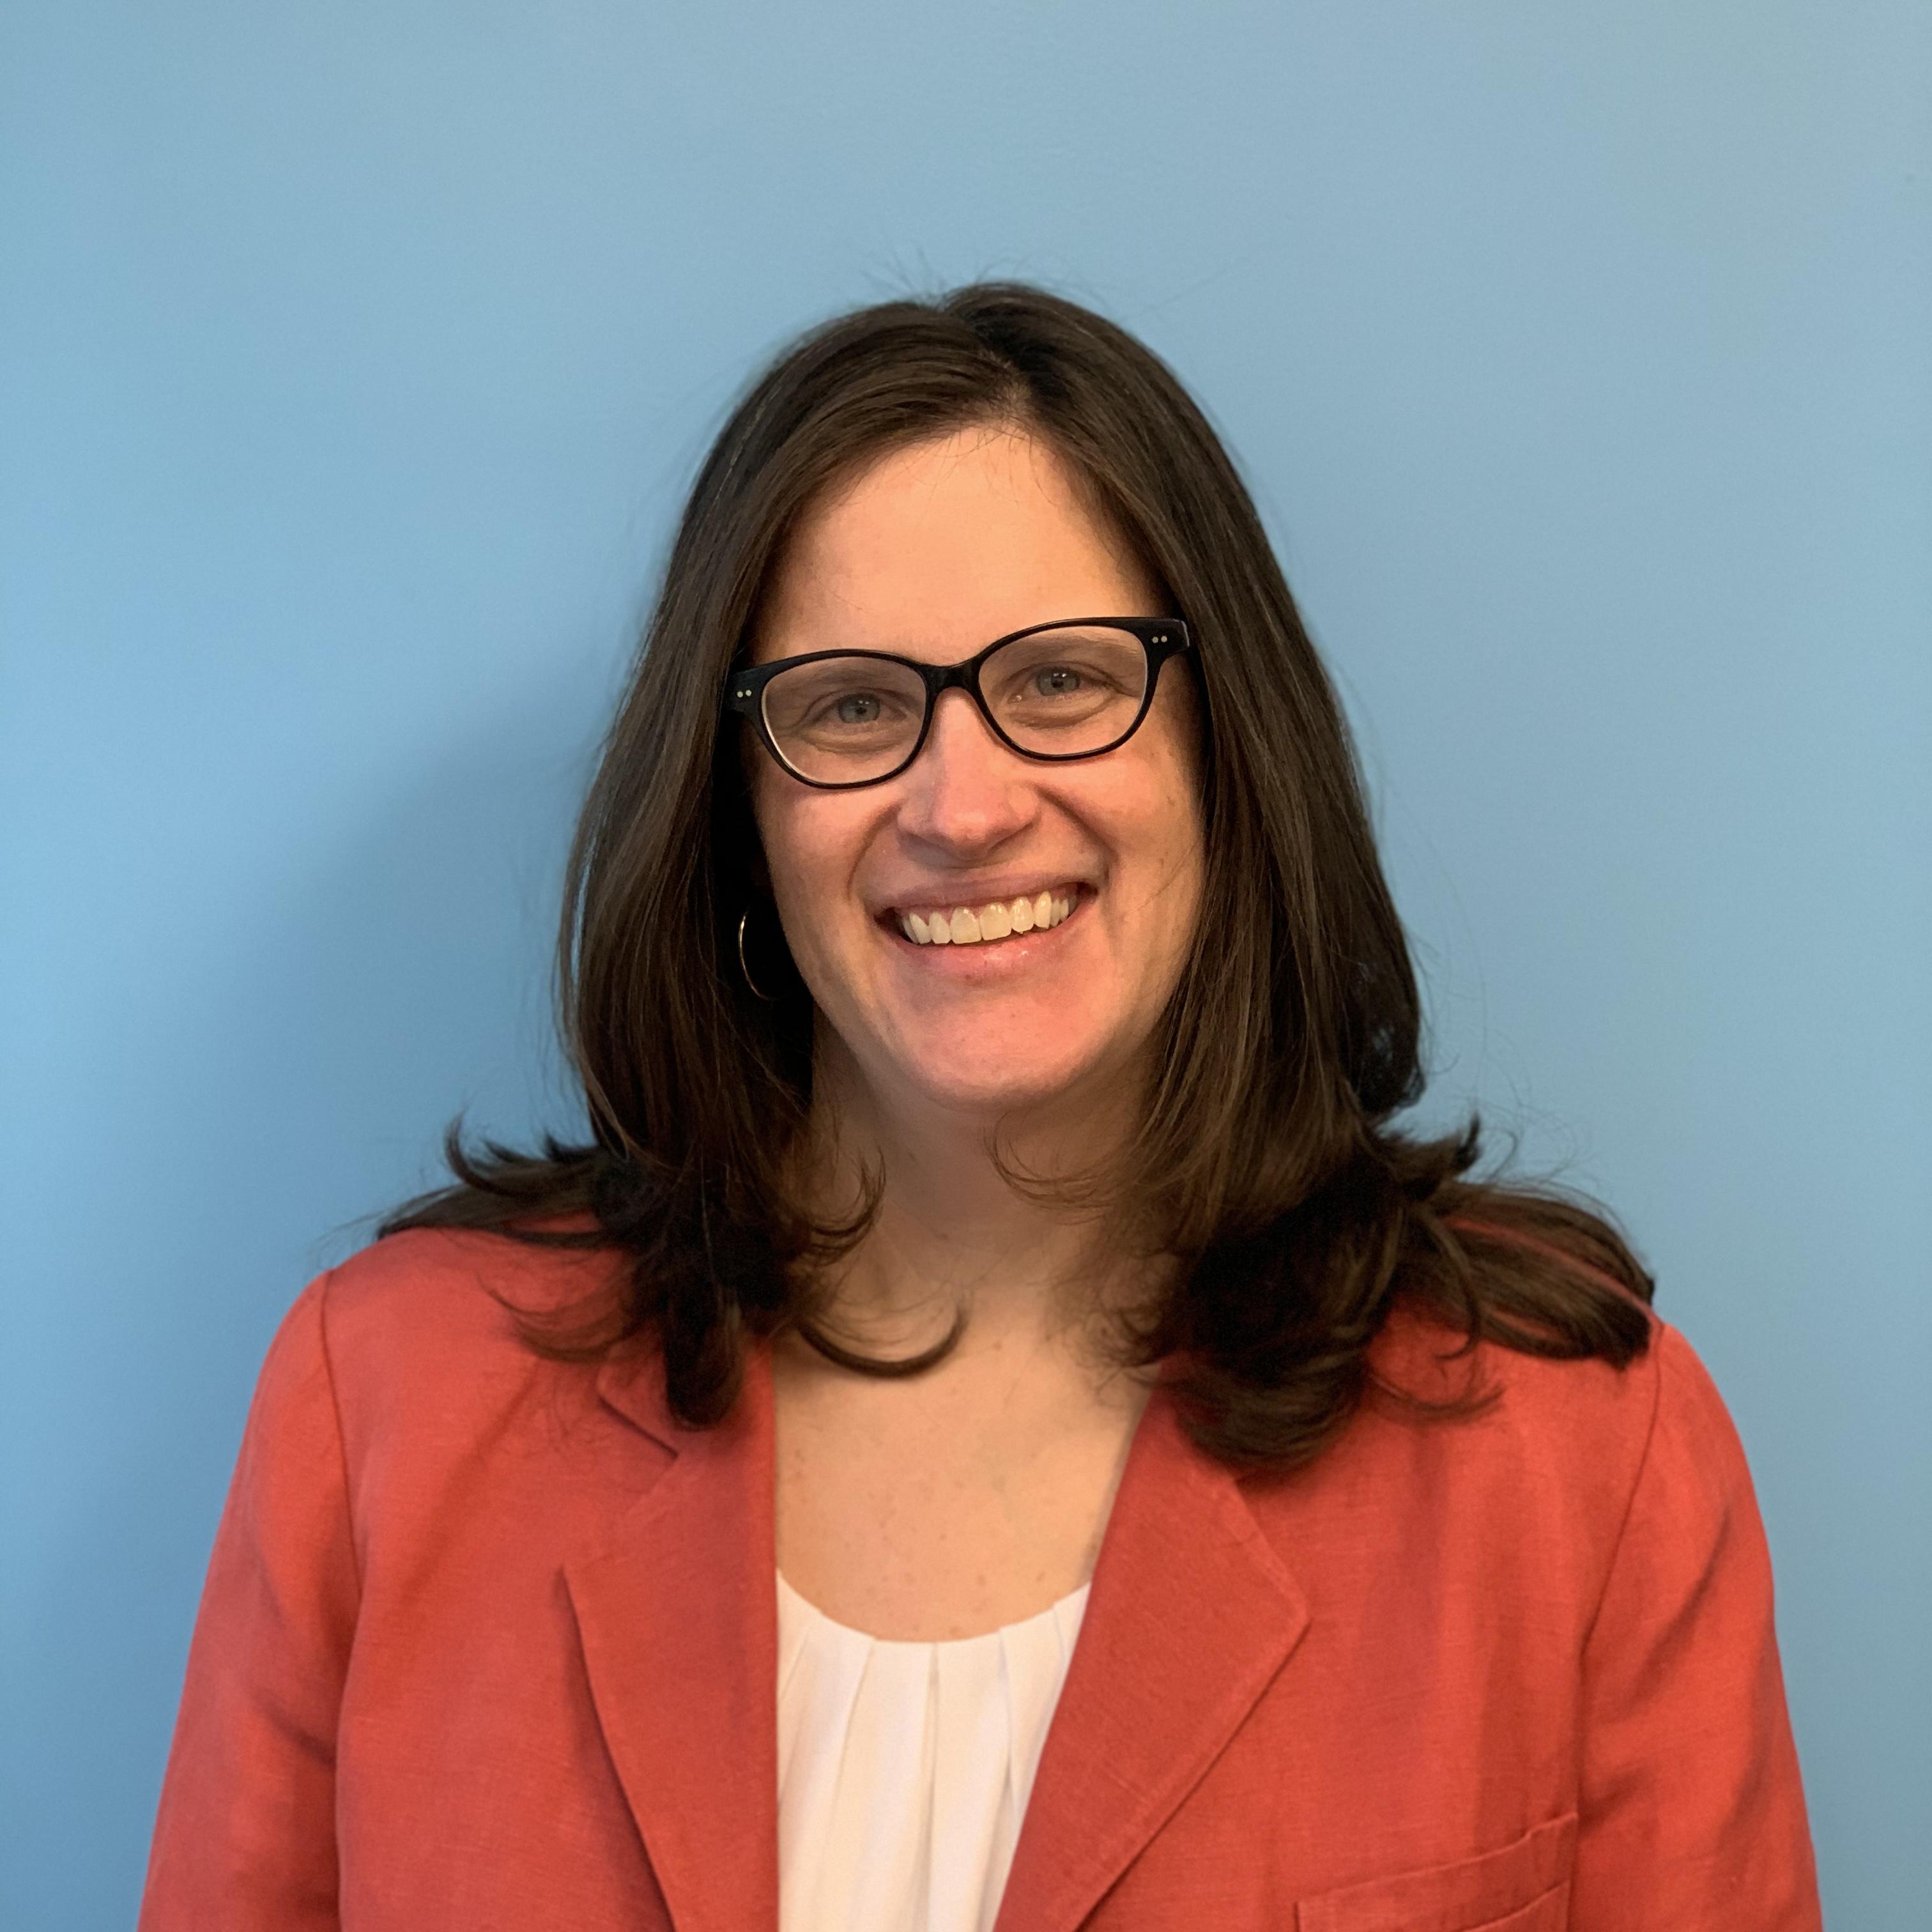 Julie Stowell, RN, CHPN